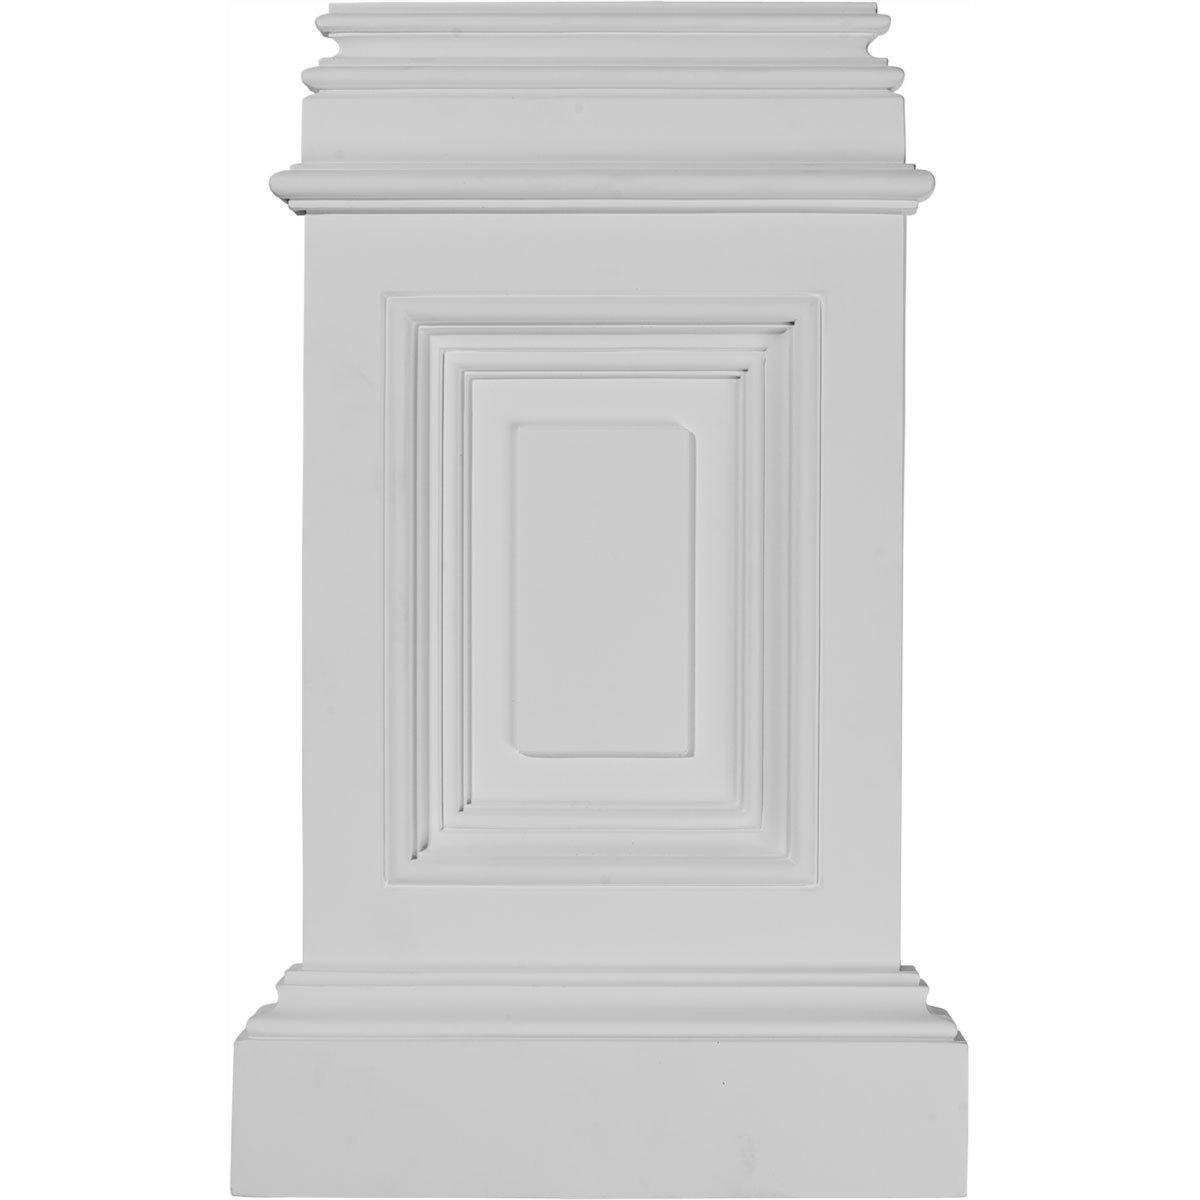 Ekena Millwork BAS10X17X02CL  10 7//8-Inch W x 2 1//4-Inch D x 17 3//4-Inch H Classic Small Pedestal Base